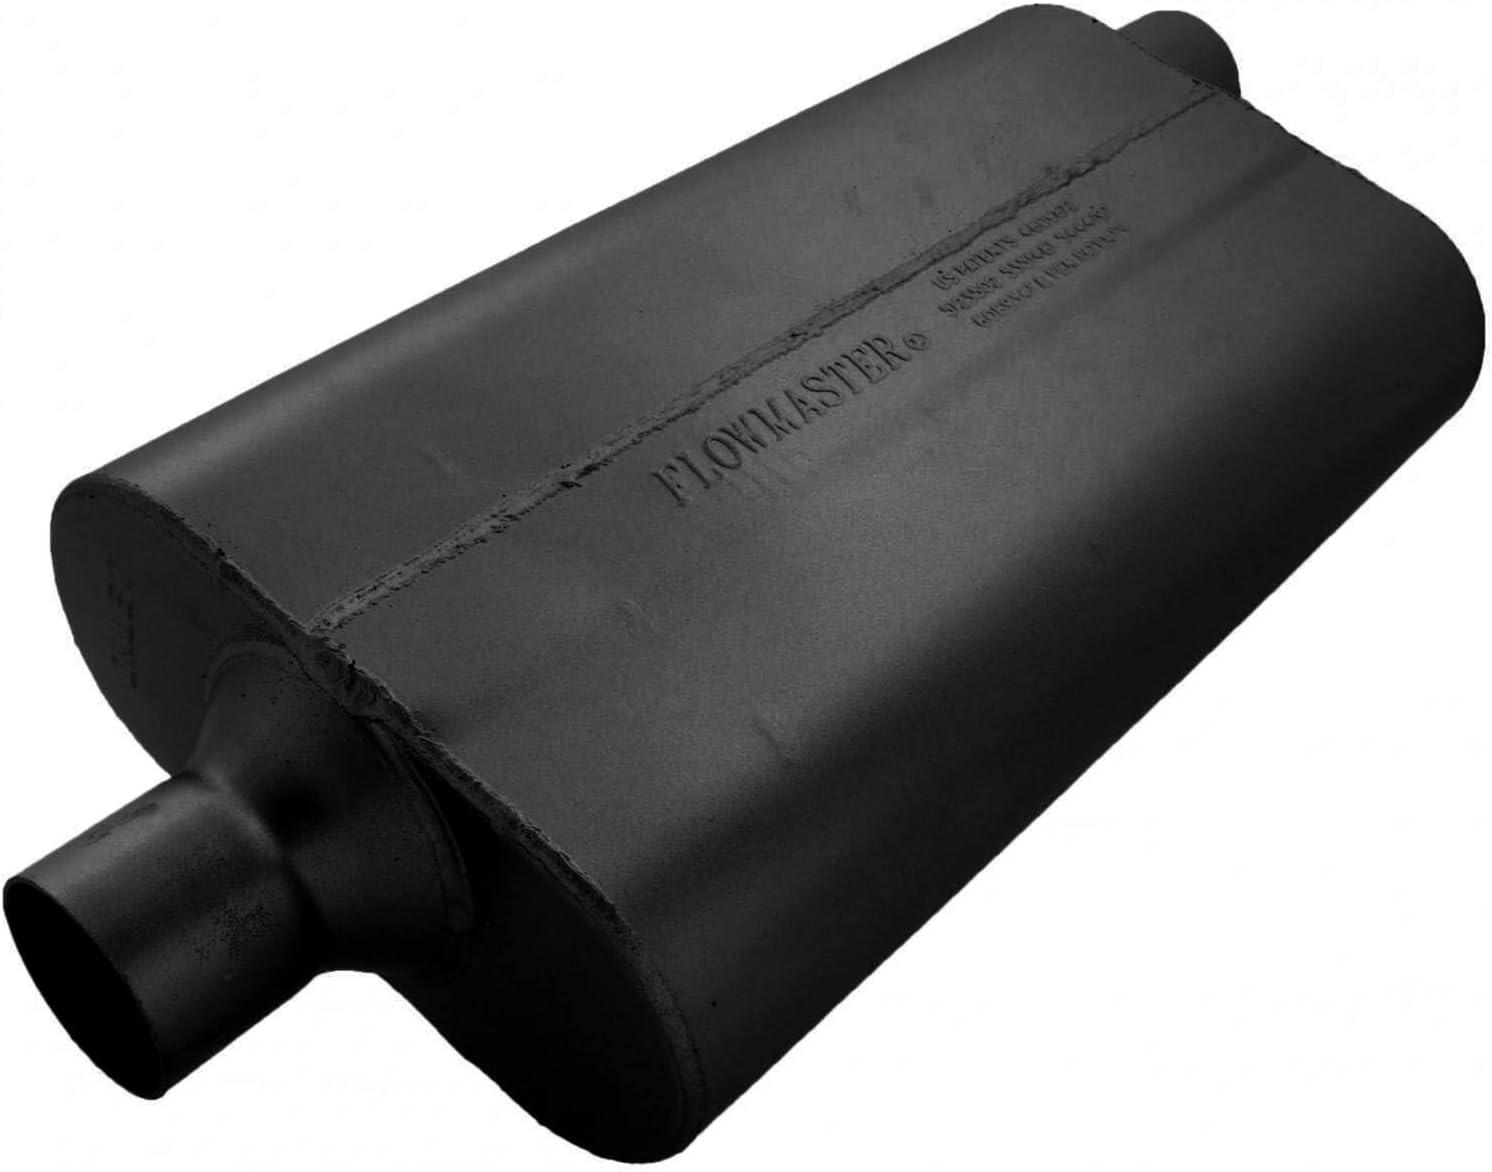 Flowmaster 942452 50 Delta Flow Muffler Center in Black 2.25 Offset Out-Moderate Sound Inlet Outlet